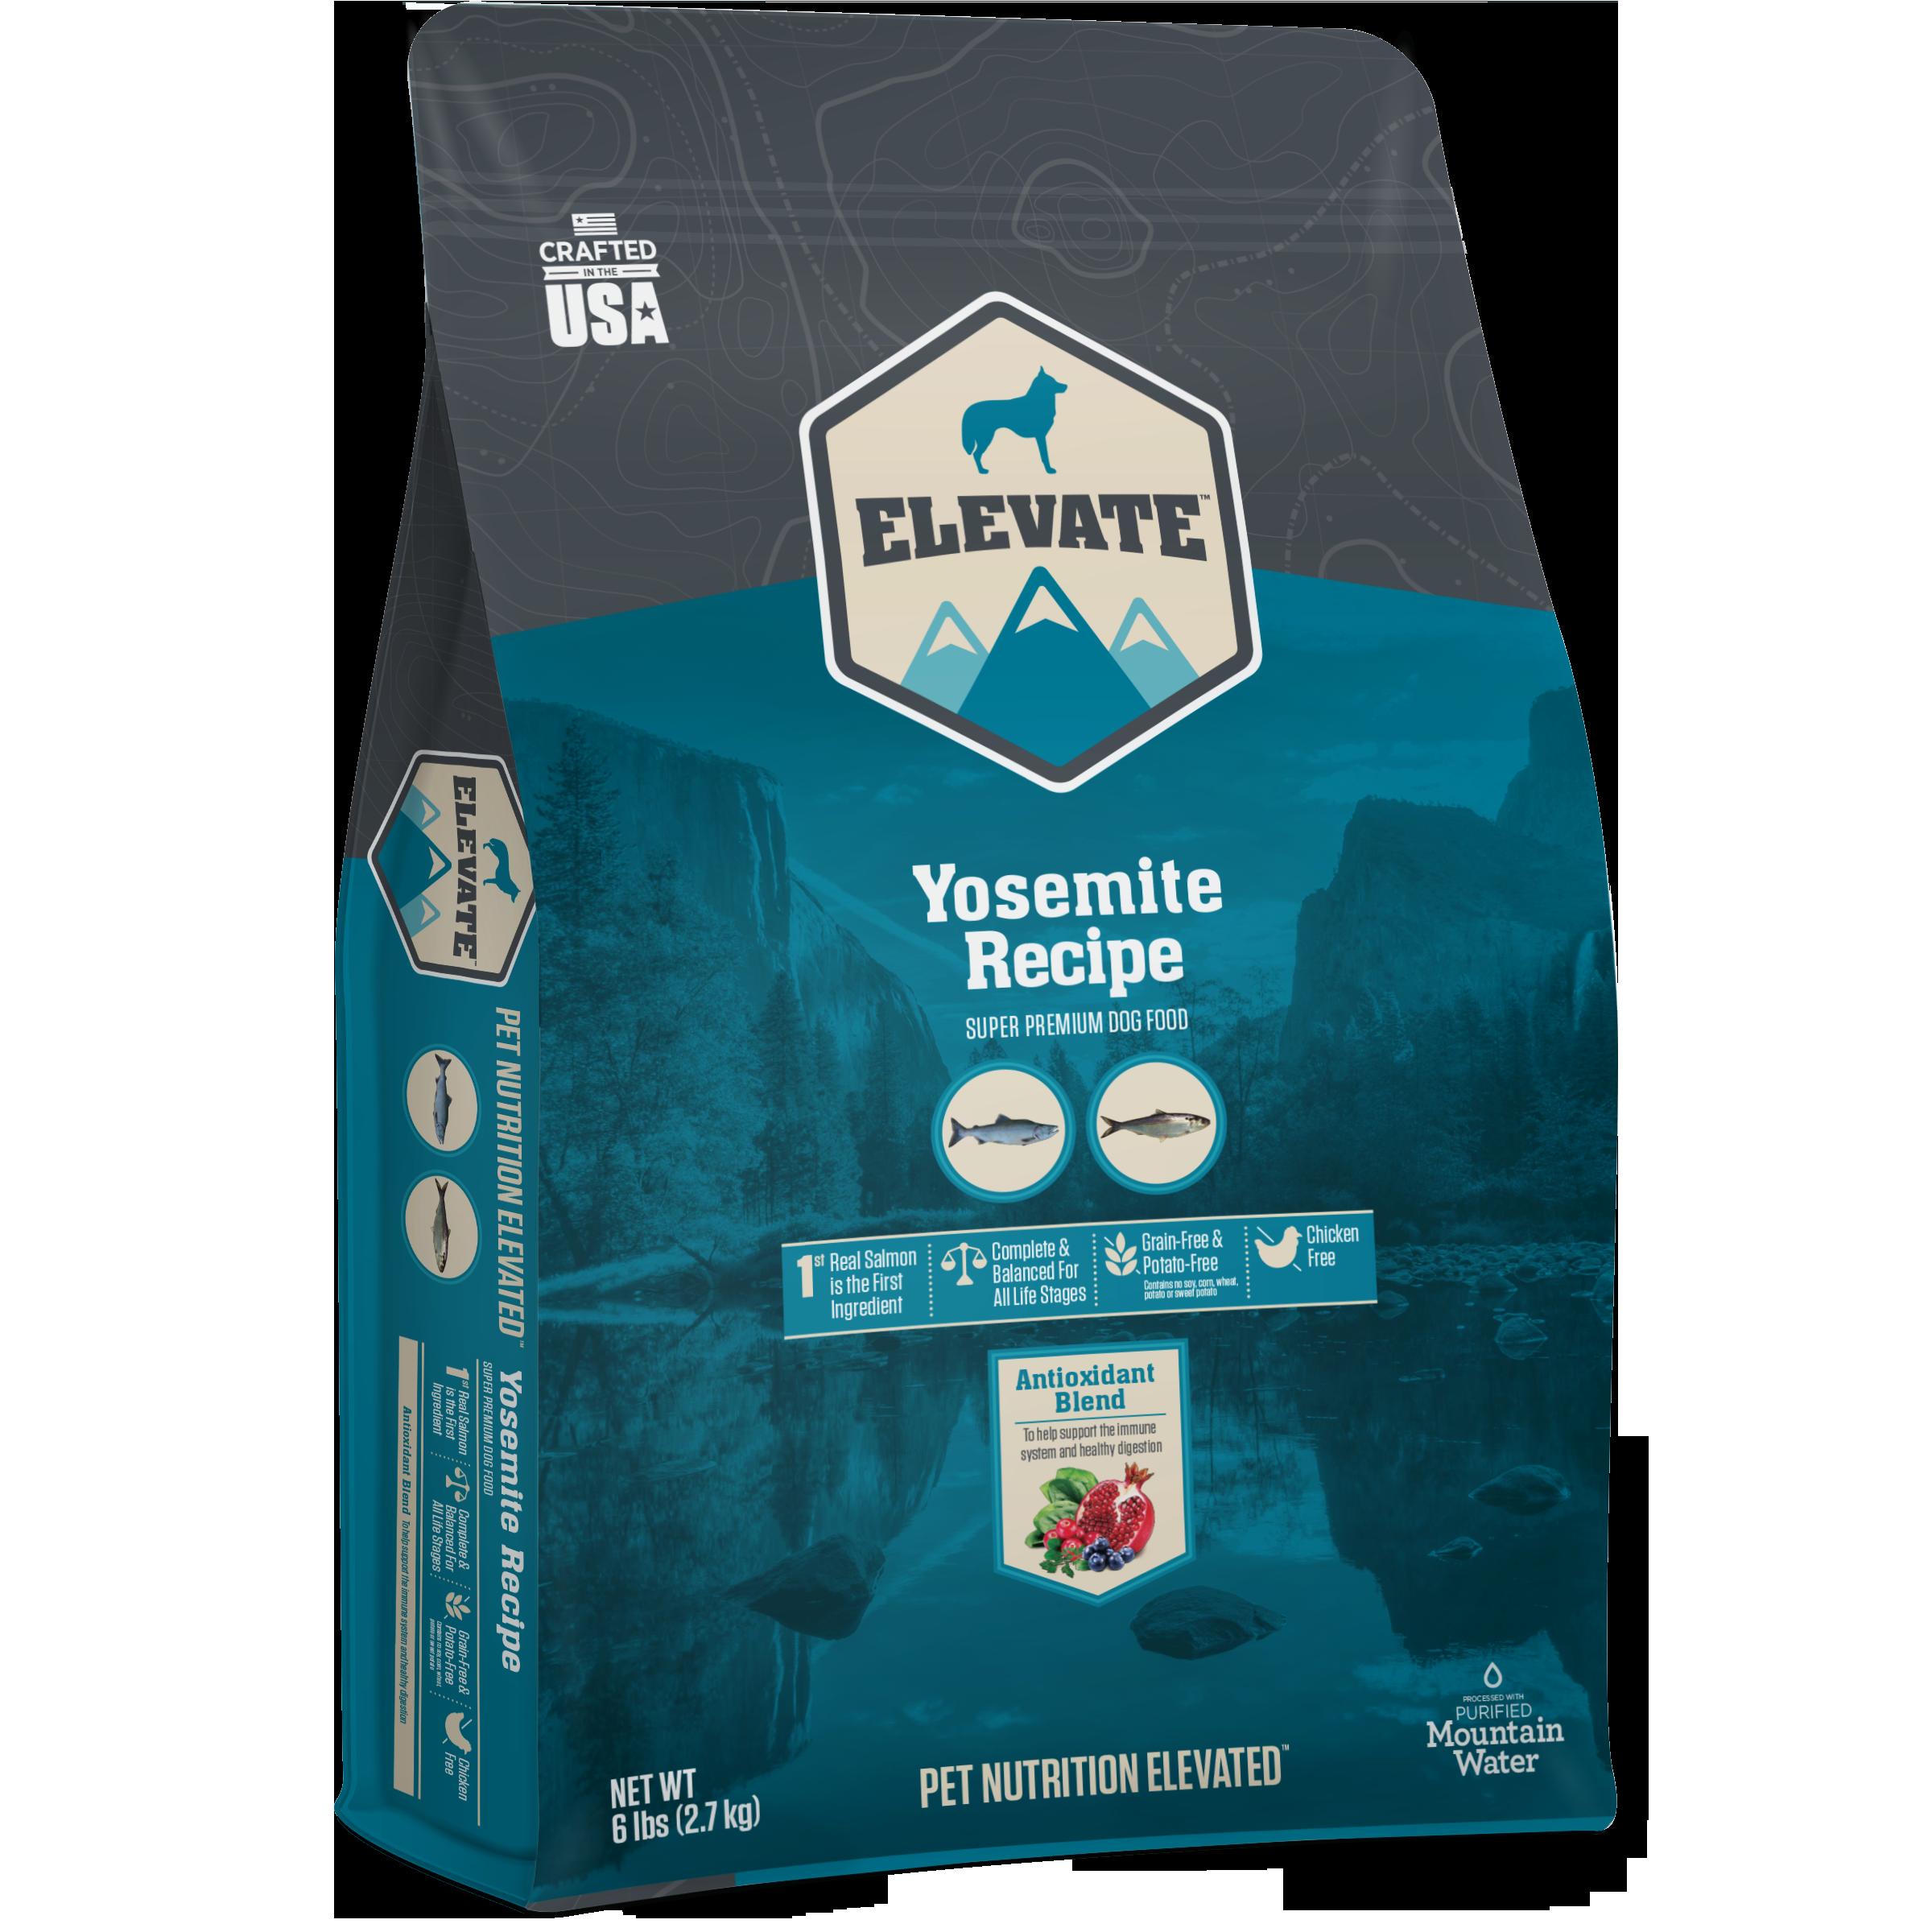 Elevate Yosemite Fish Recipe Super Premium Grain-Free Dry Dog Food, 6-lb